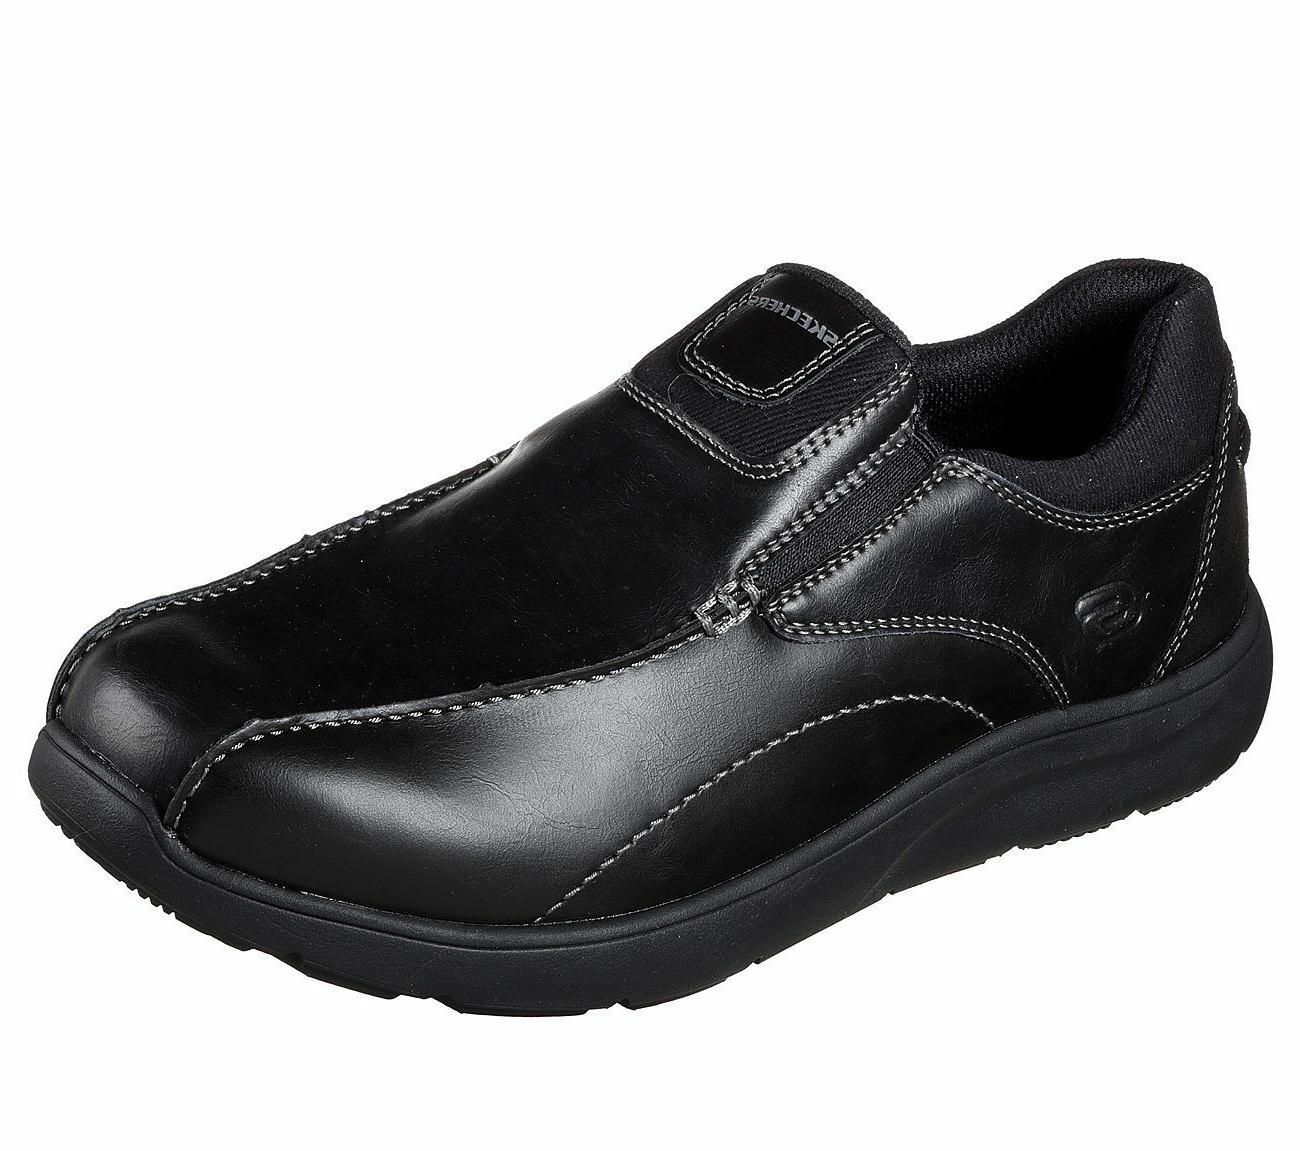 memory foam shoes black men s dress